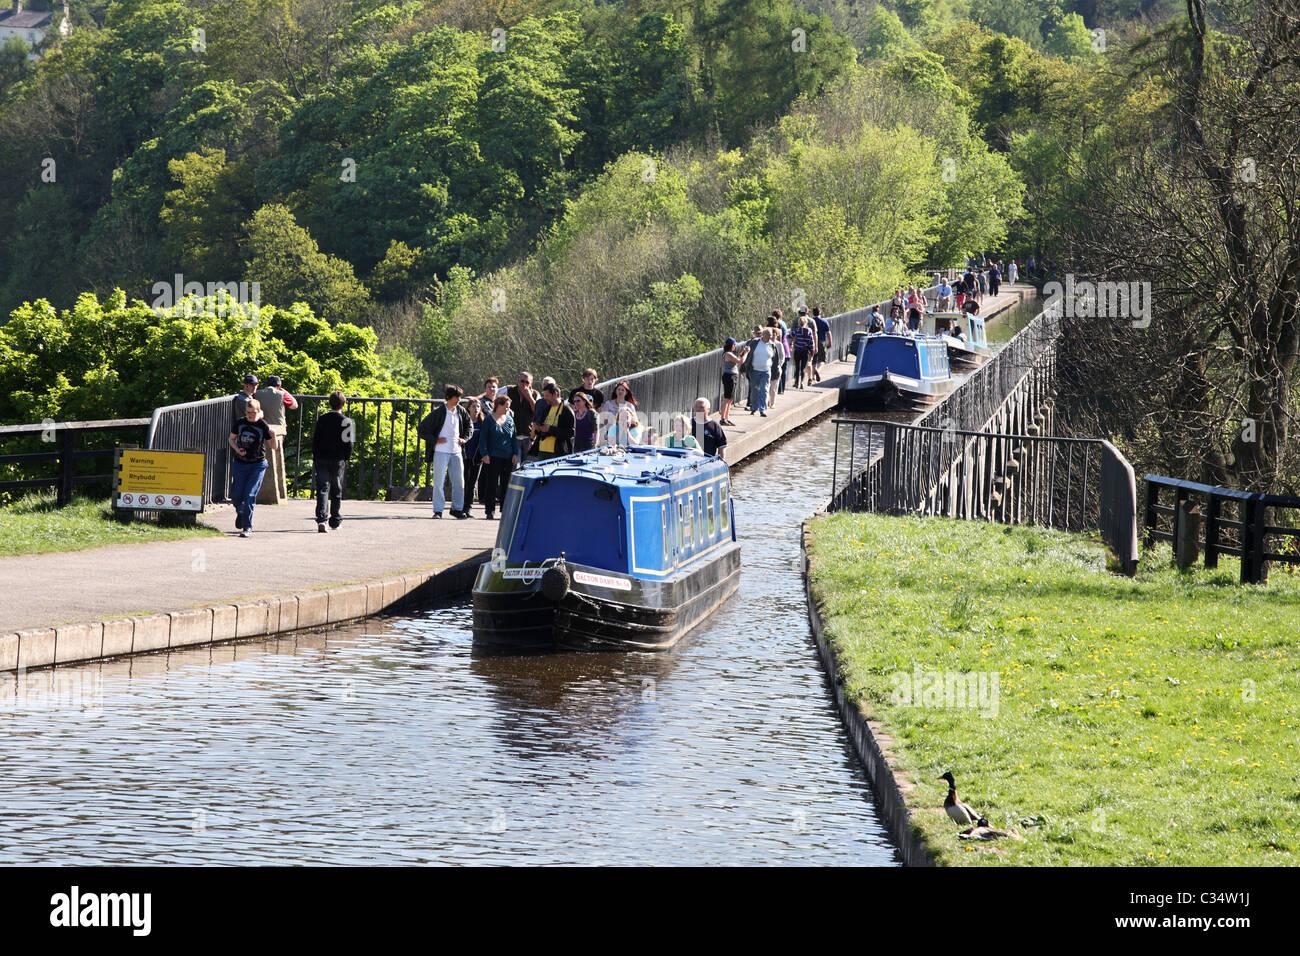 Narrow boats cross the Pontcysyllte Aqueduct at Llangollen, Wales, UK Stock Photo